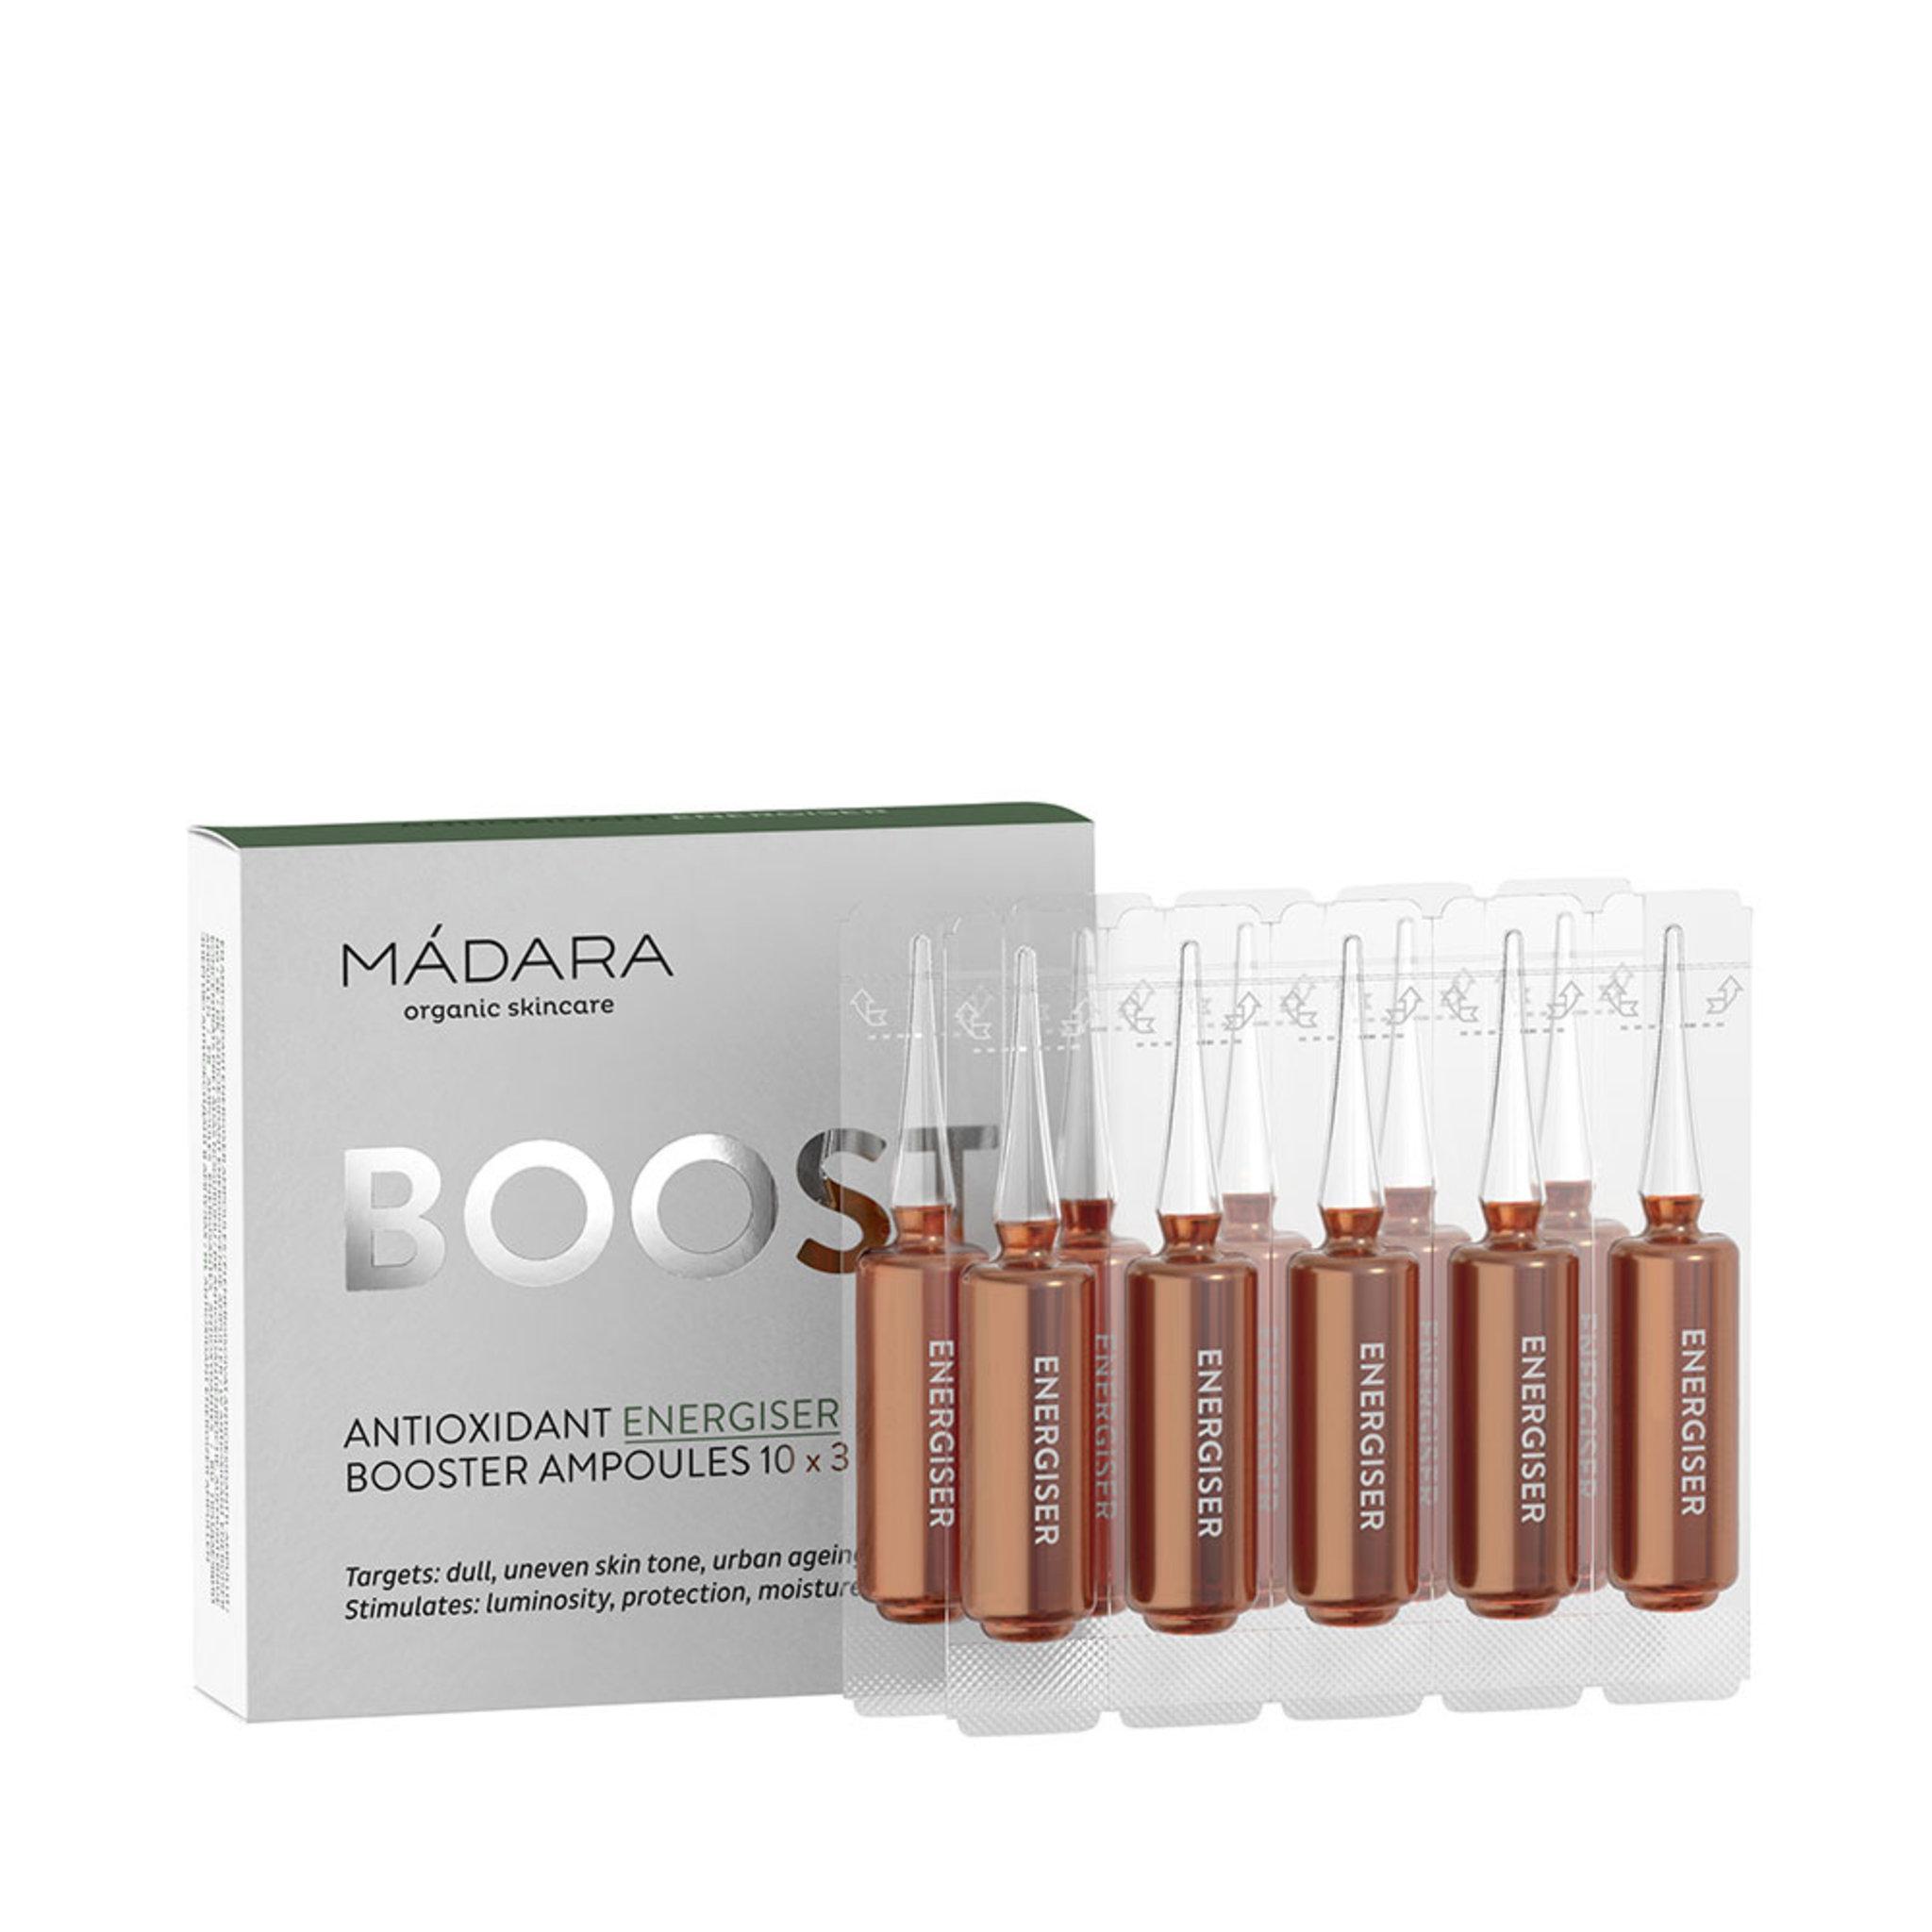 Antioxidant Energiser Ampoules, 3ml x 10pcs